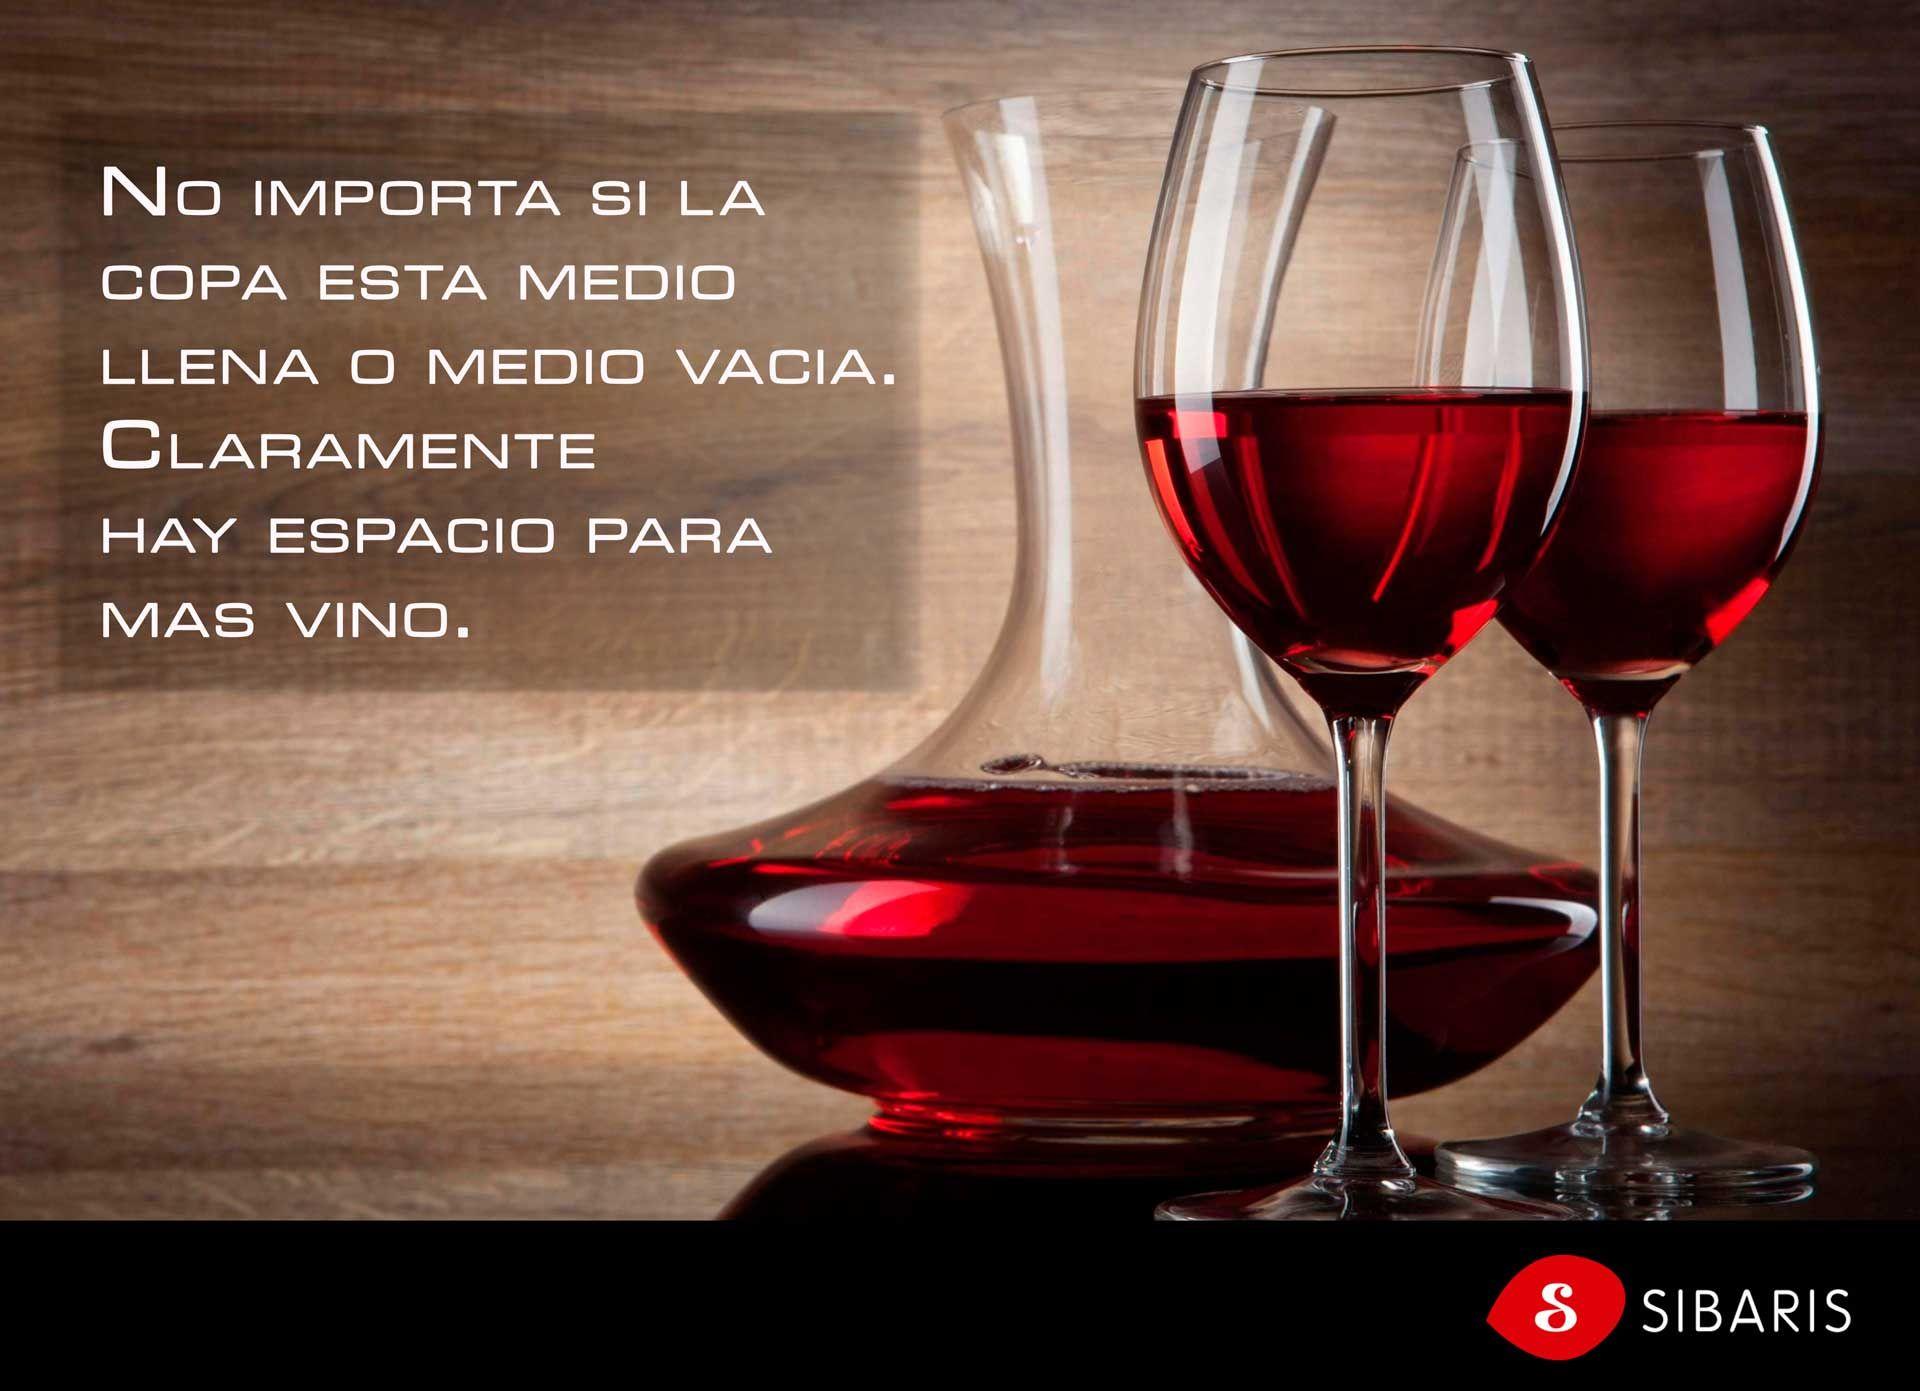 Medio Llena Medio Vacia I Don T Care Mas Vino Porfavor Soysibarita Sibaritaslife Happyfriday Red Wine Wine Wallpaper Red Wine Glasses